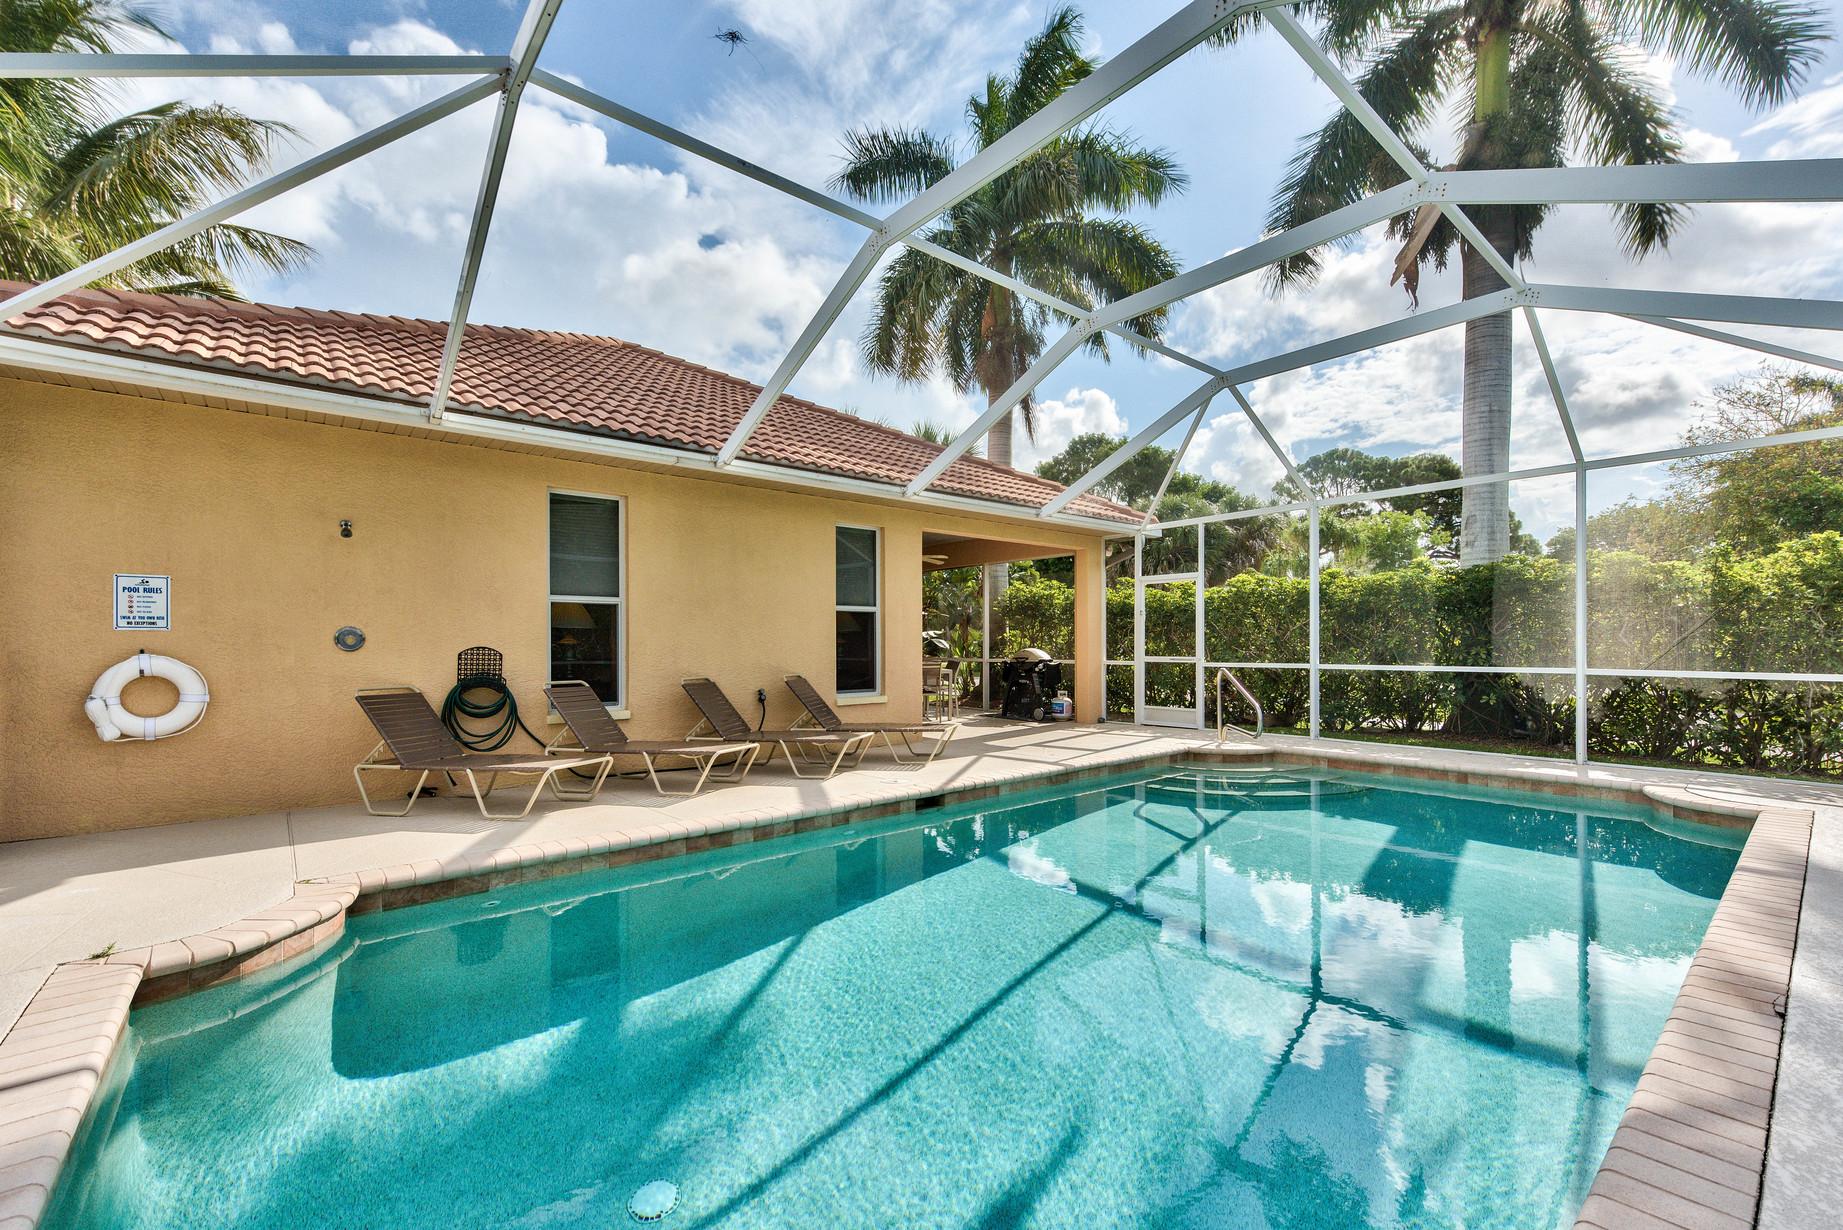 Vanderbilt Beach Rental (Walk to the Beach) - pool home!